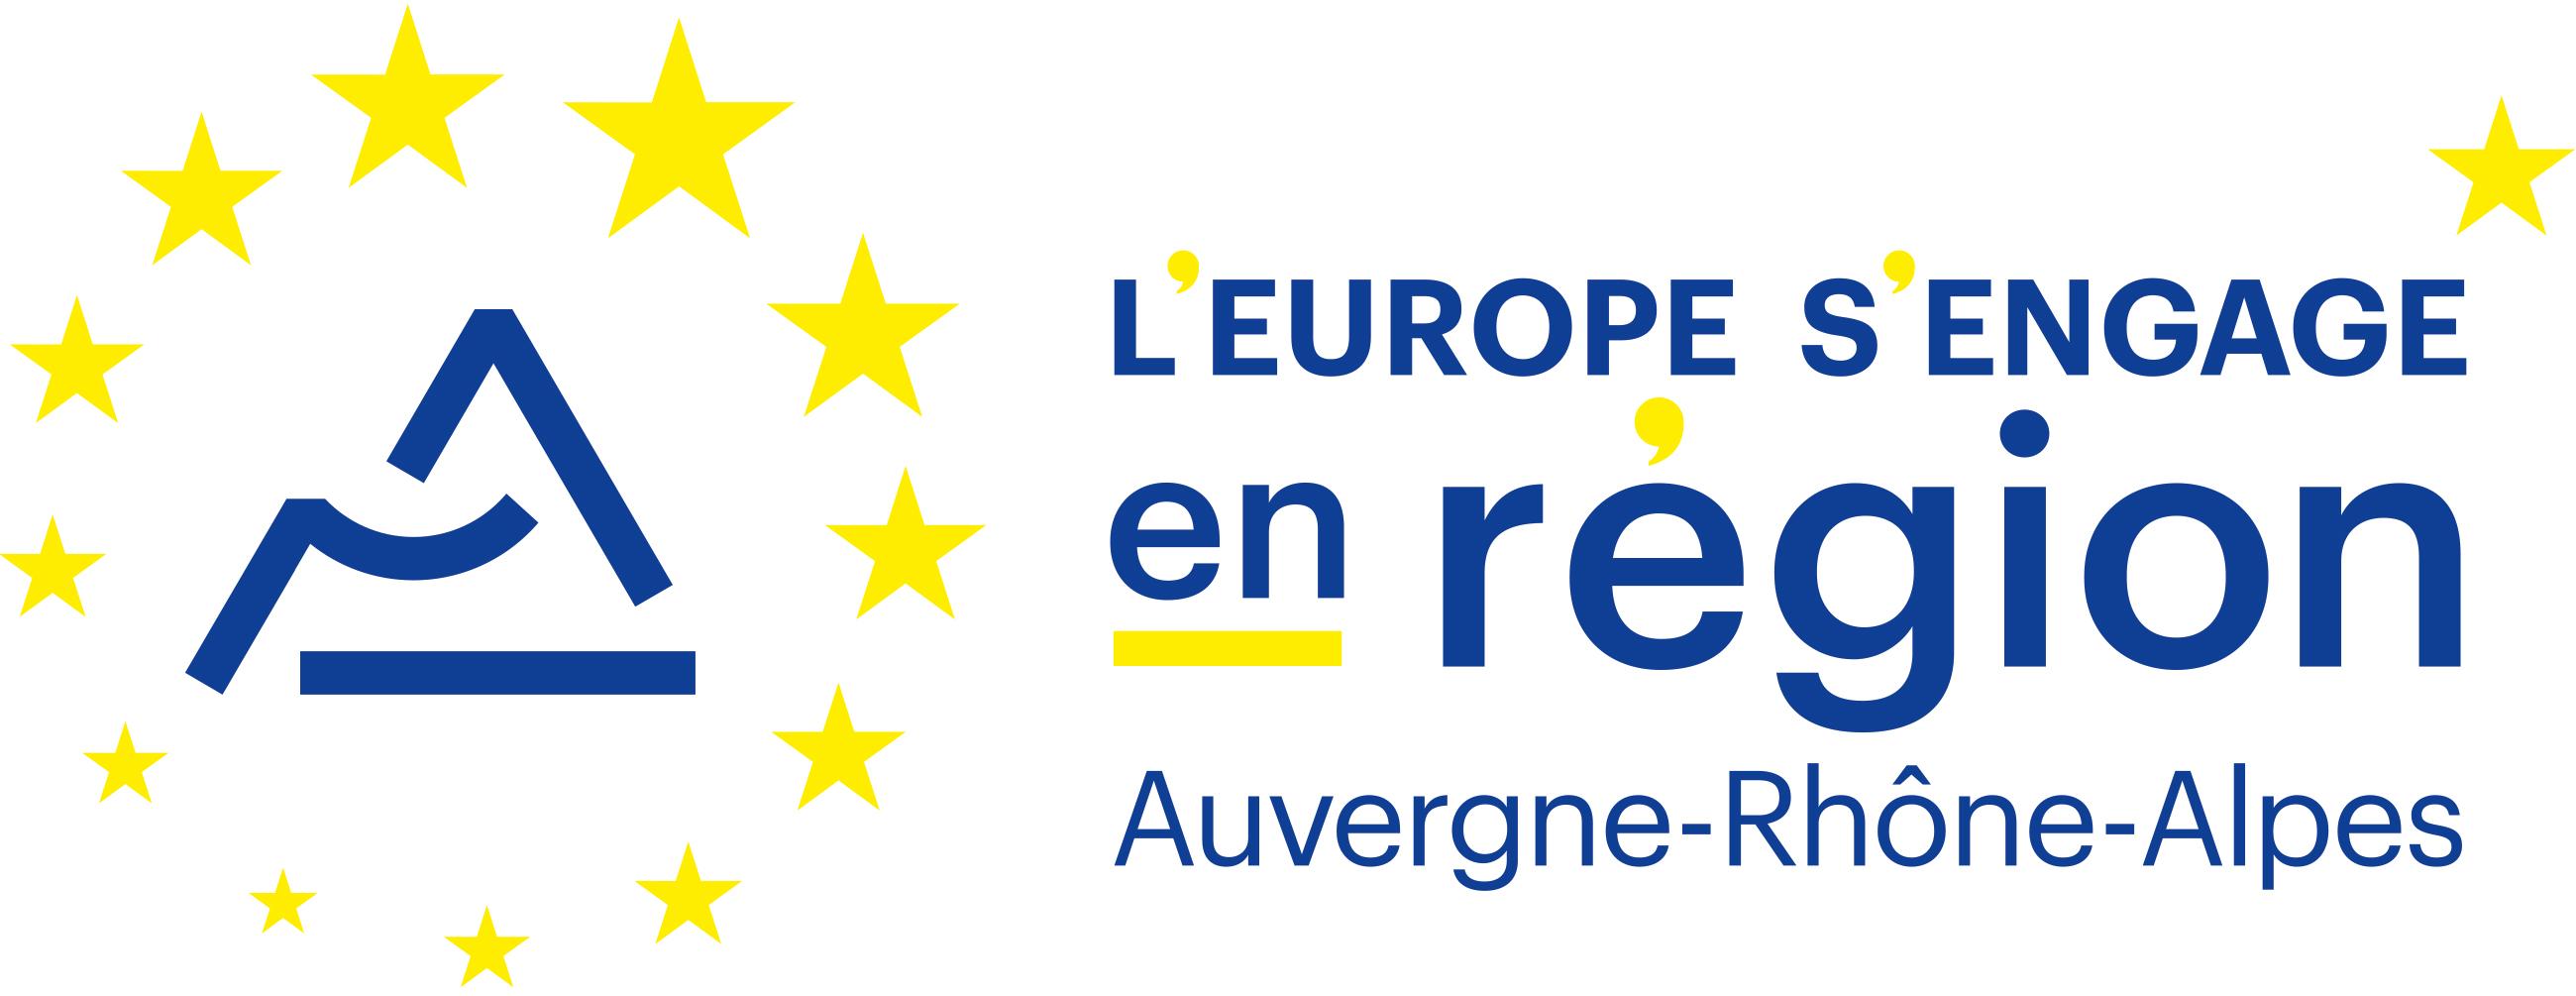 L'Europe s'engage en Auvergne-Rhône-Alpes